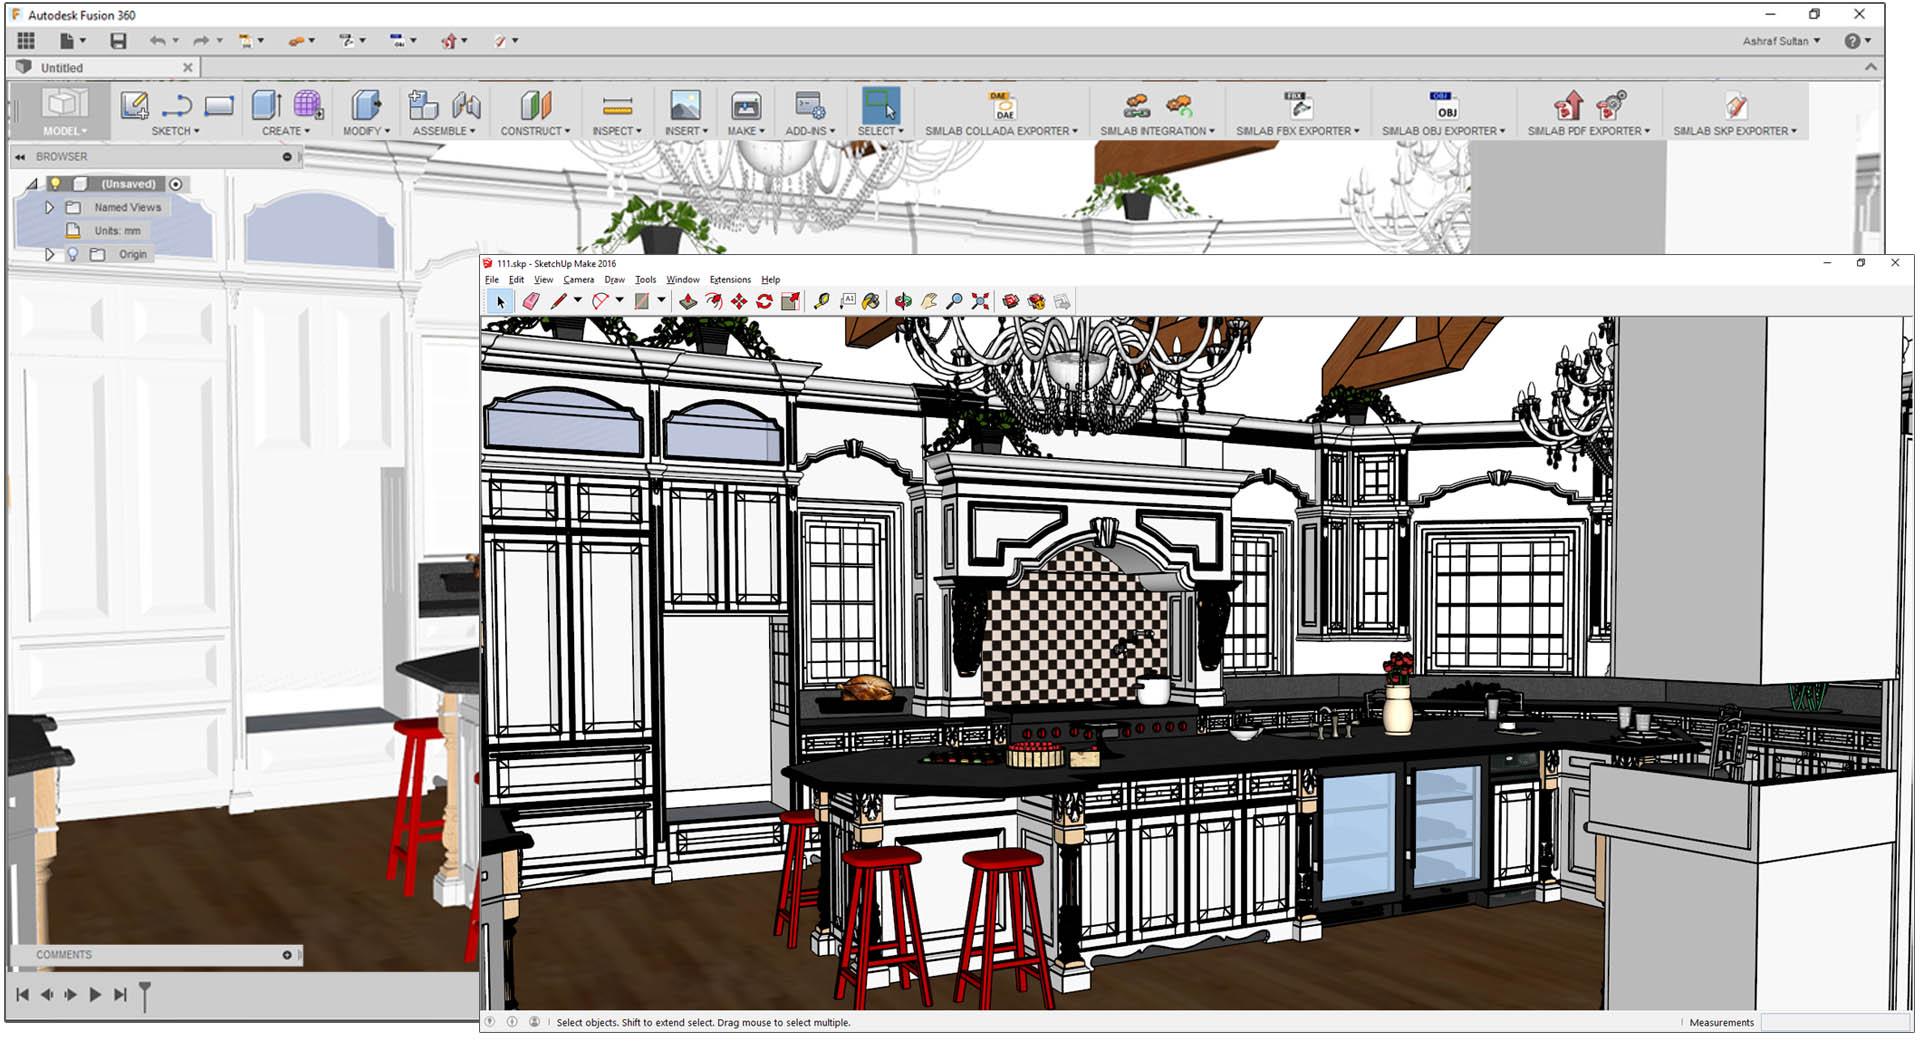 Image Result For Sketchup Add Plugins